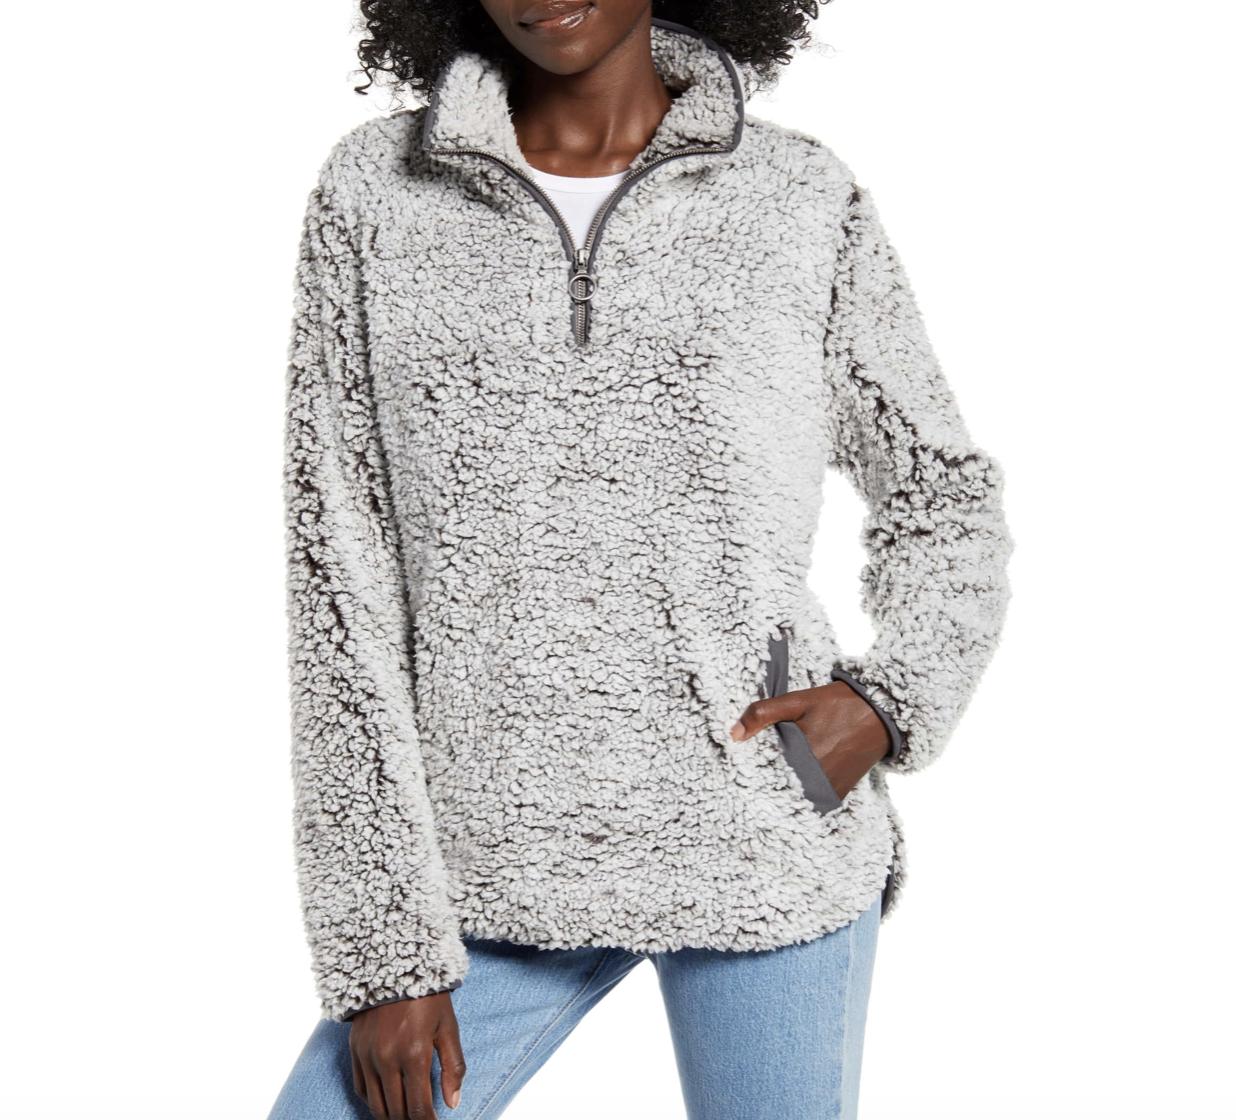 Gray Fleece Pullover | Nordstrom Anniversary Sale 2019 | A Demure Life Fashion Blog